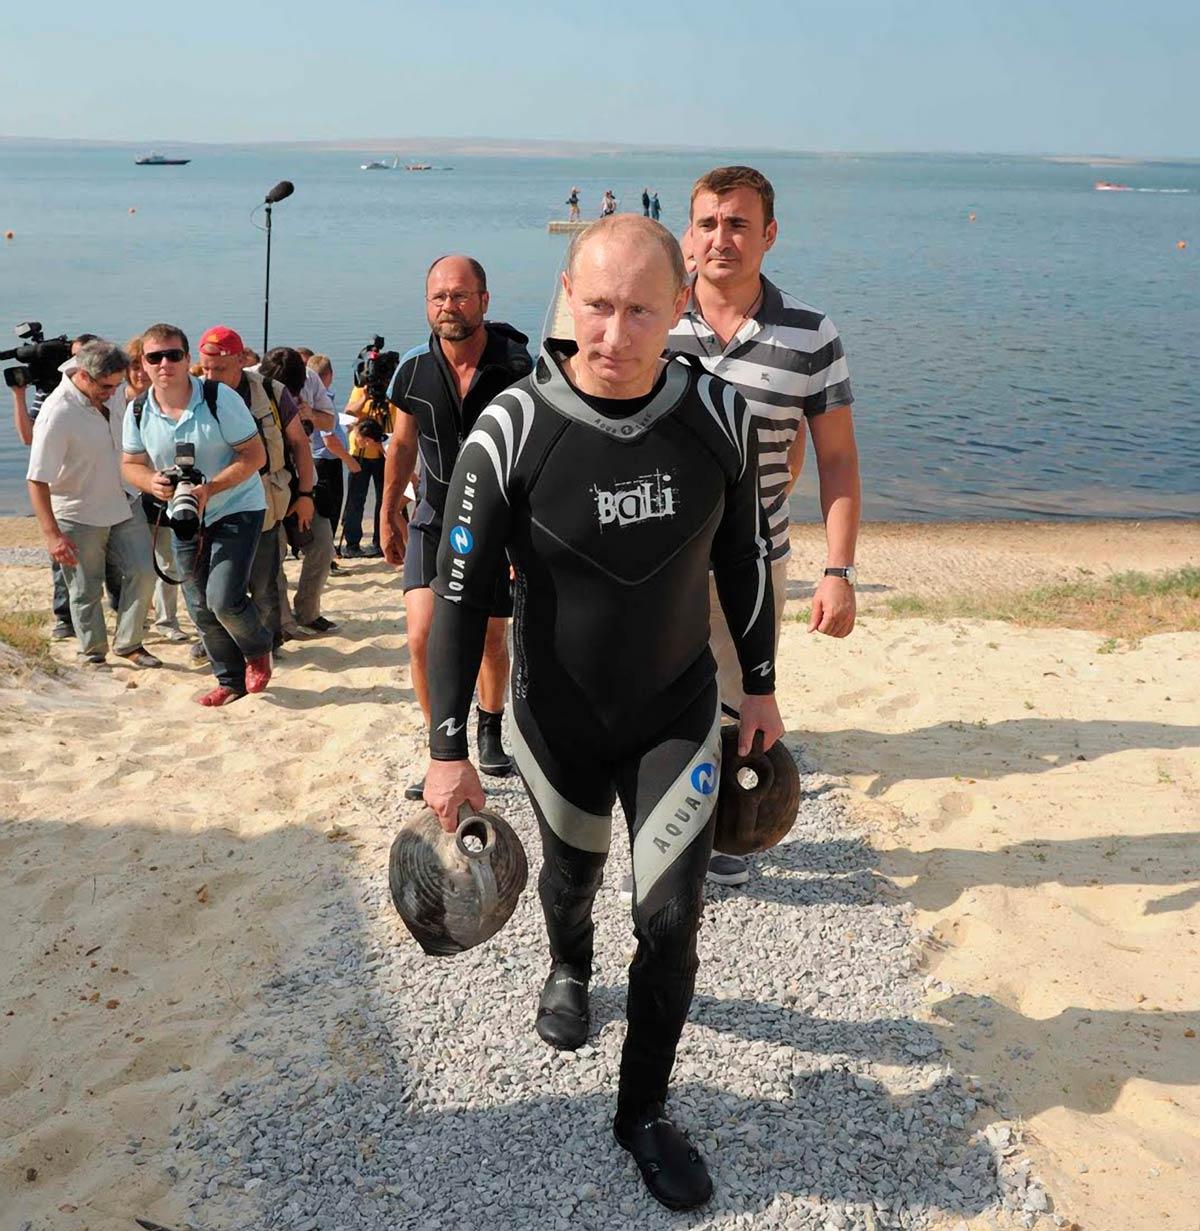 В.В. Путин поднял с морского дна древние амфоры